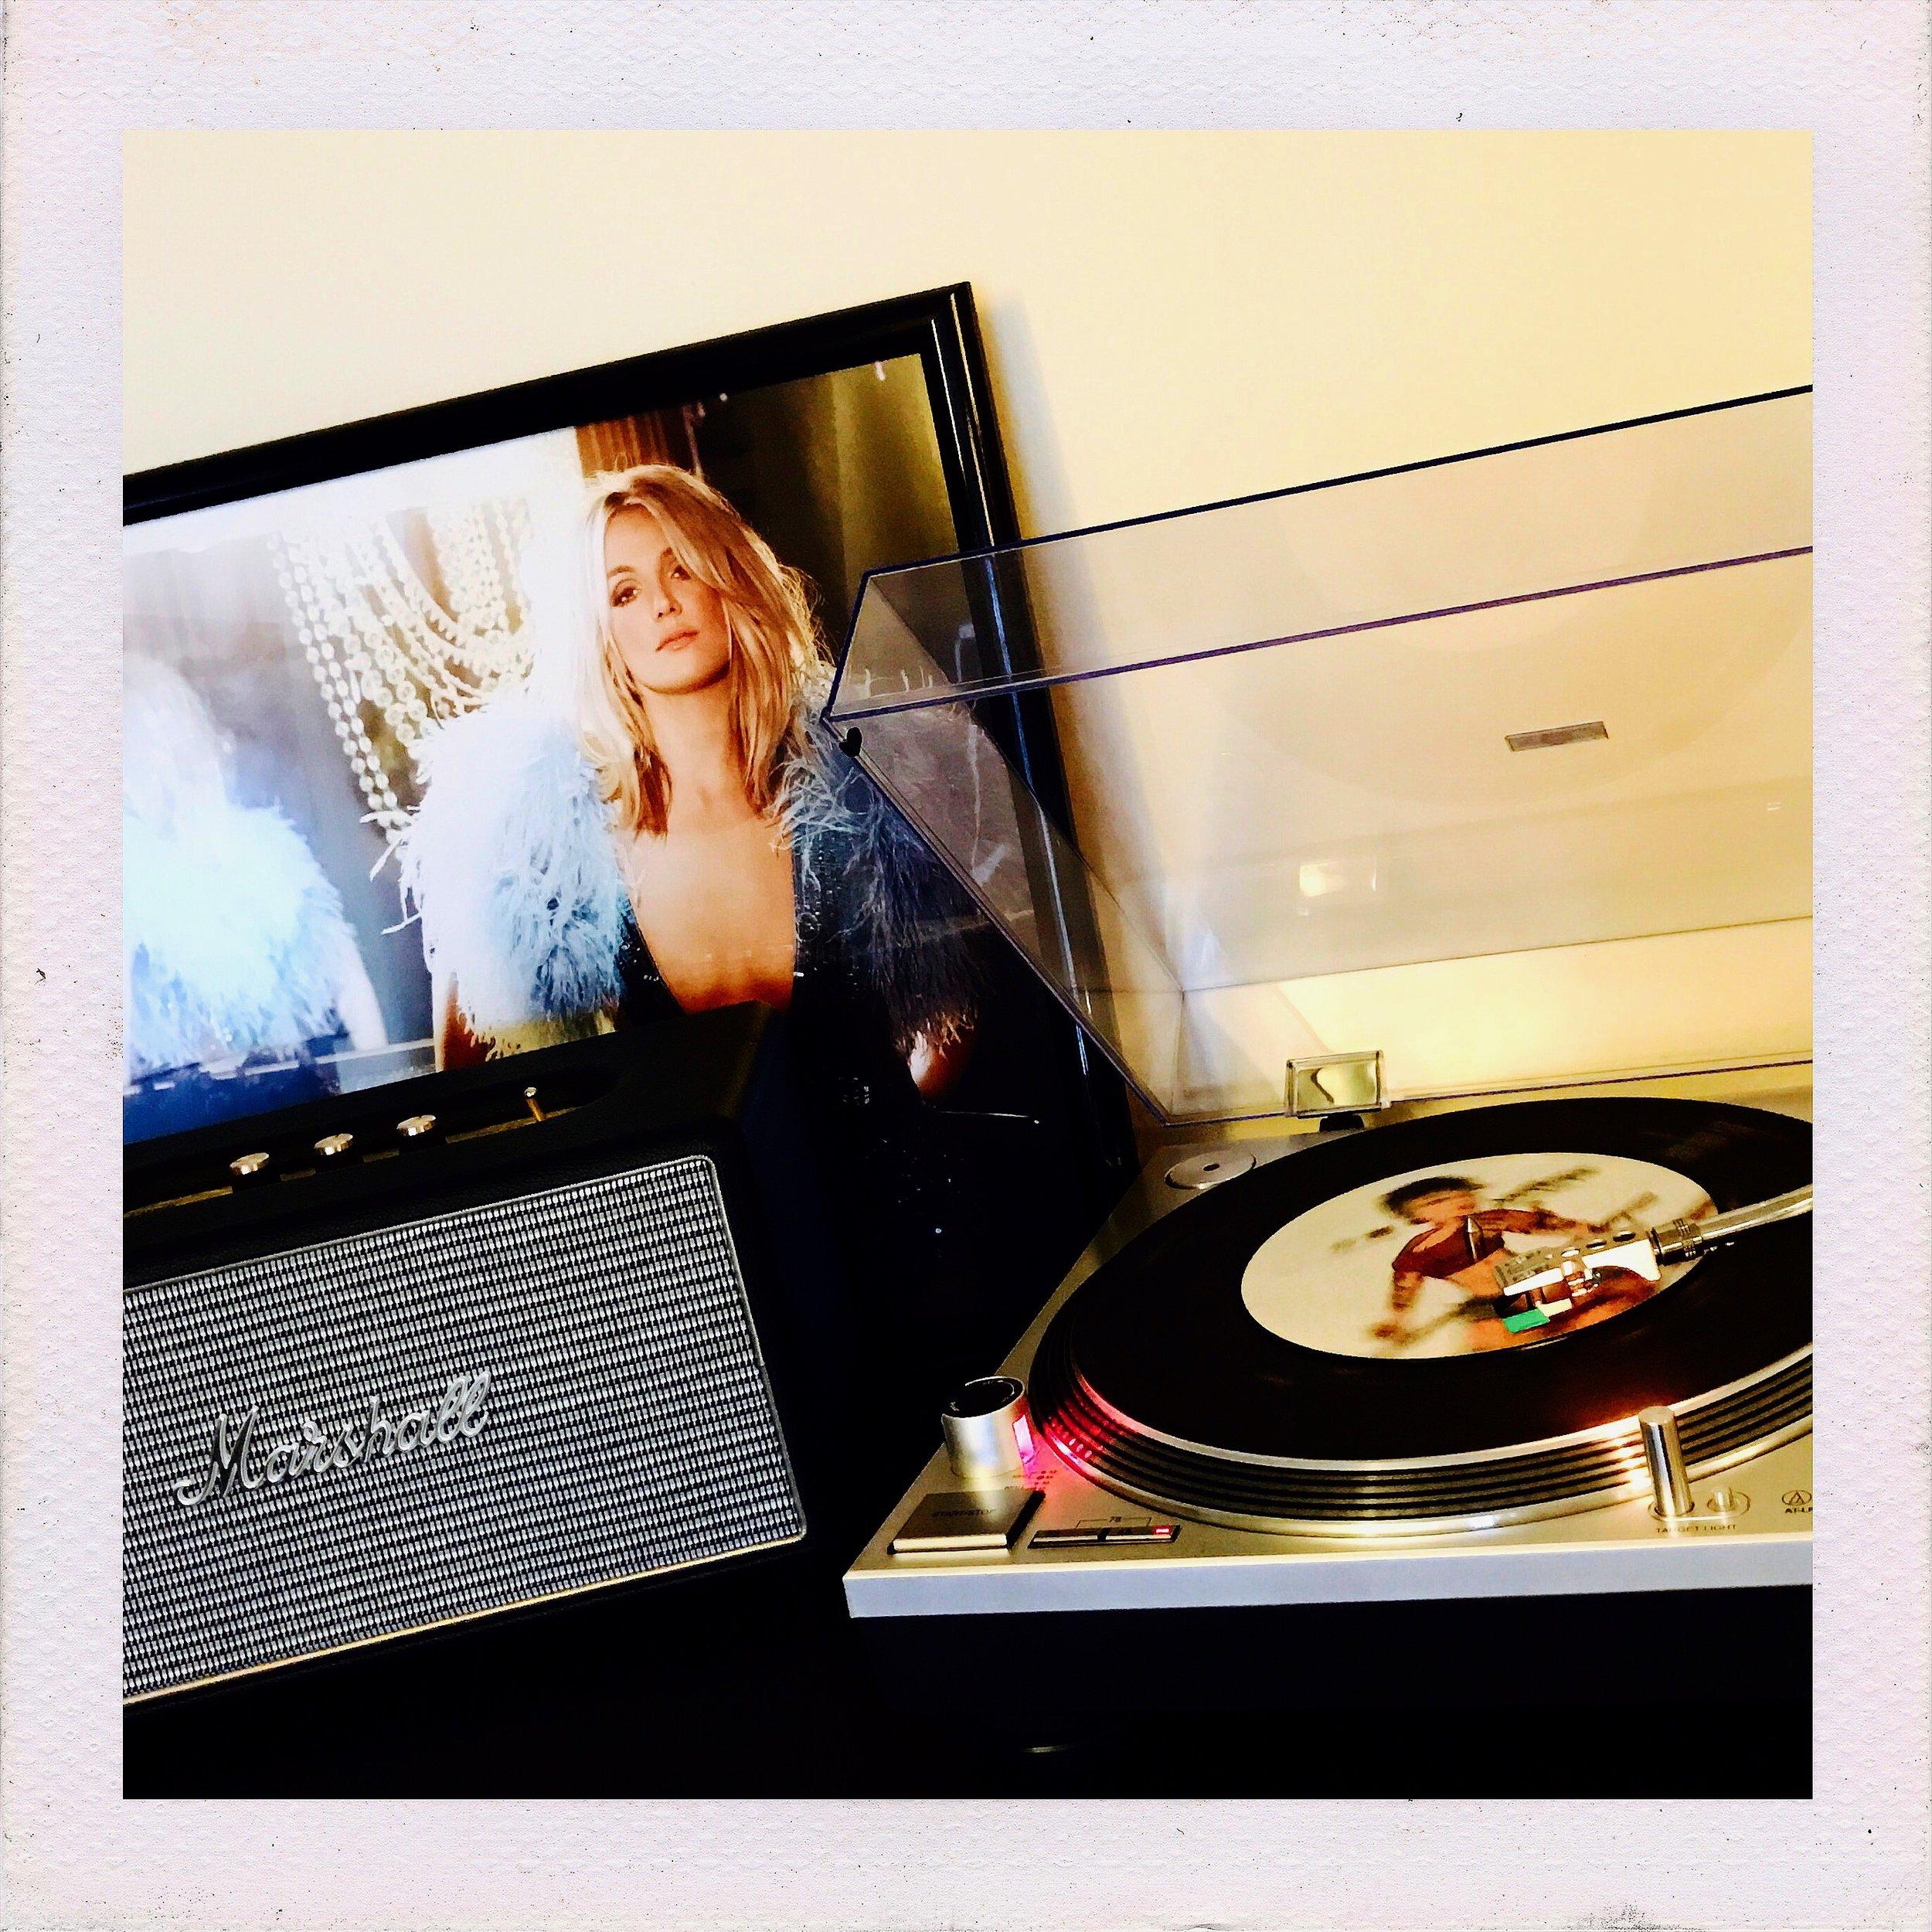 "Kehlani 7"" vinyl spinning on my setup.  Instagram: @DerekPlease"